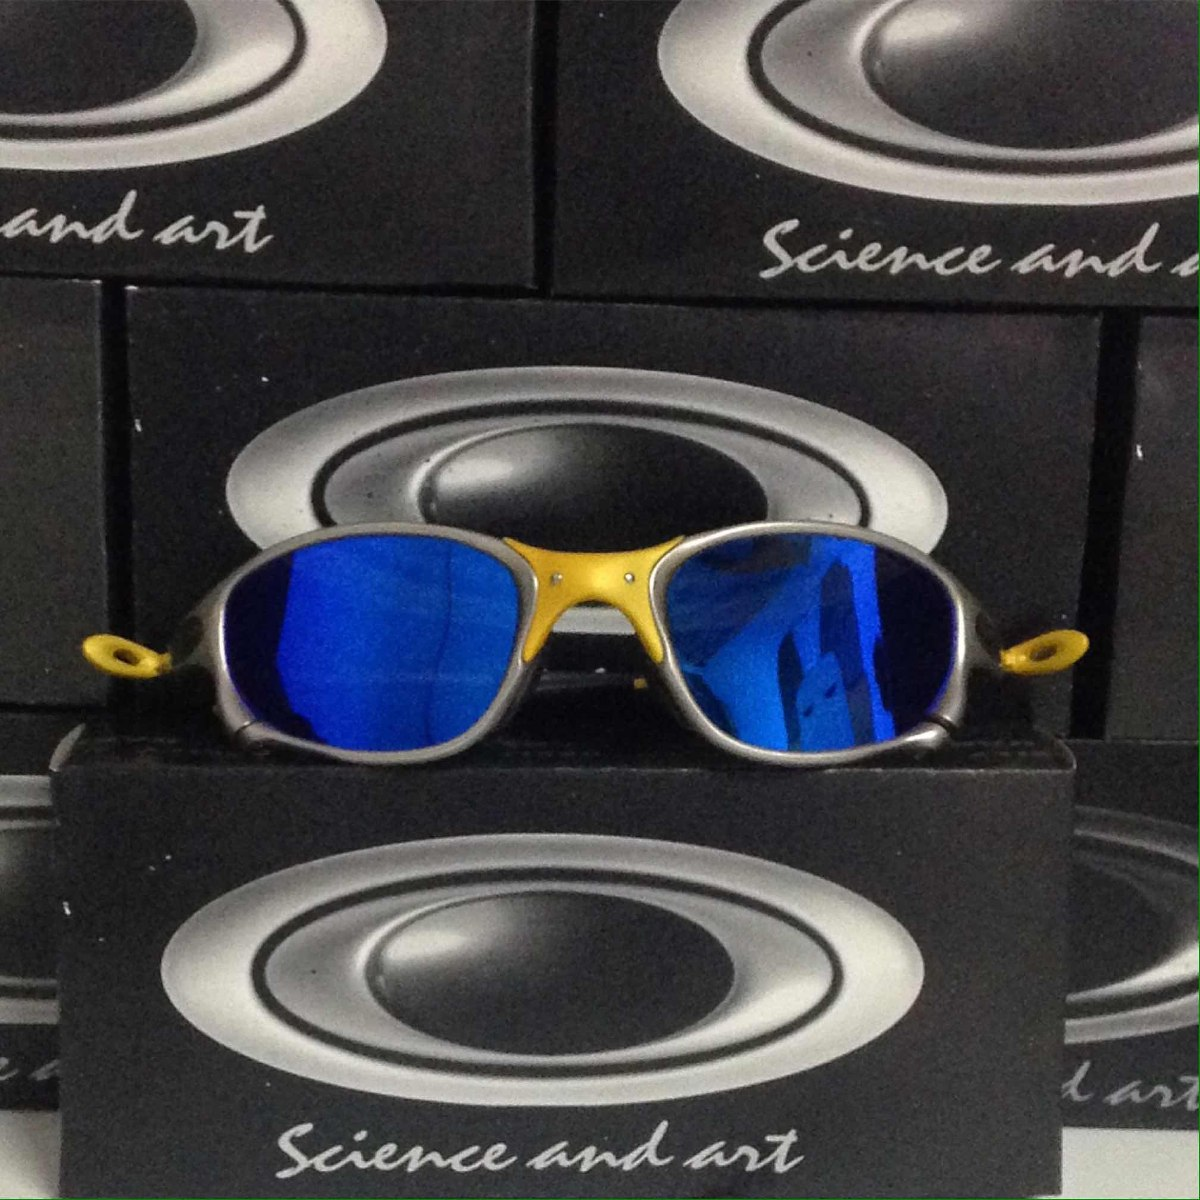 24b757ad6d571 Double X 24k Óculos Oakley Rp - R  177,00 em Mercado Livre